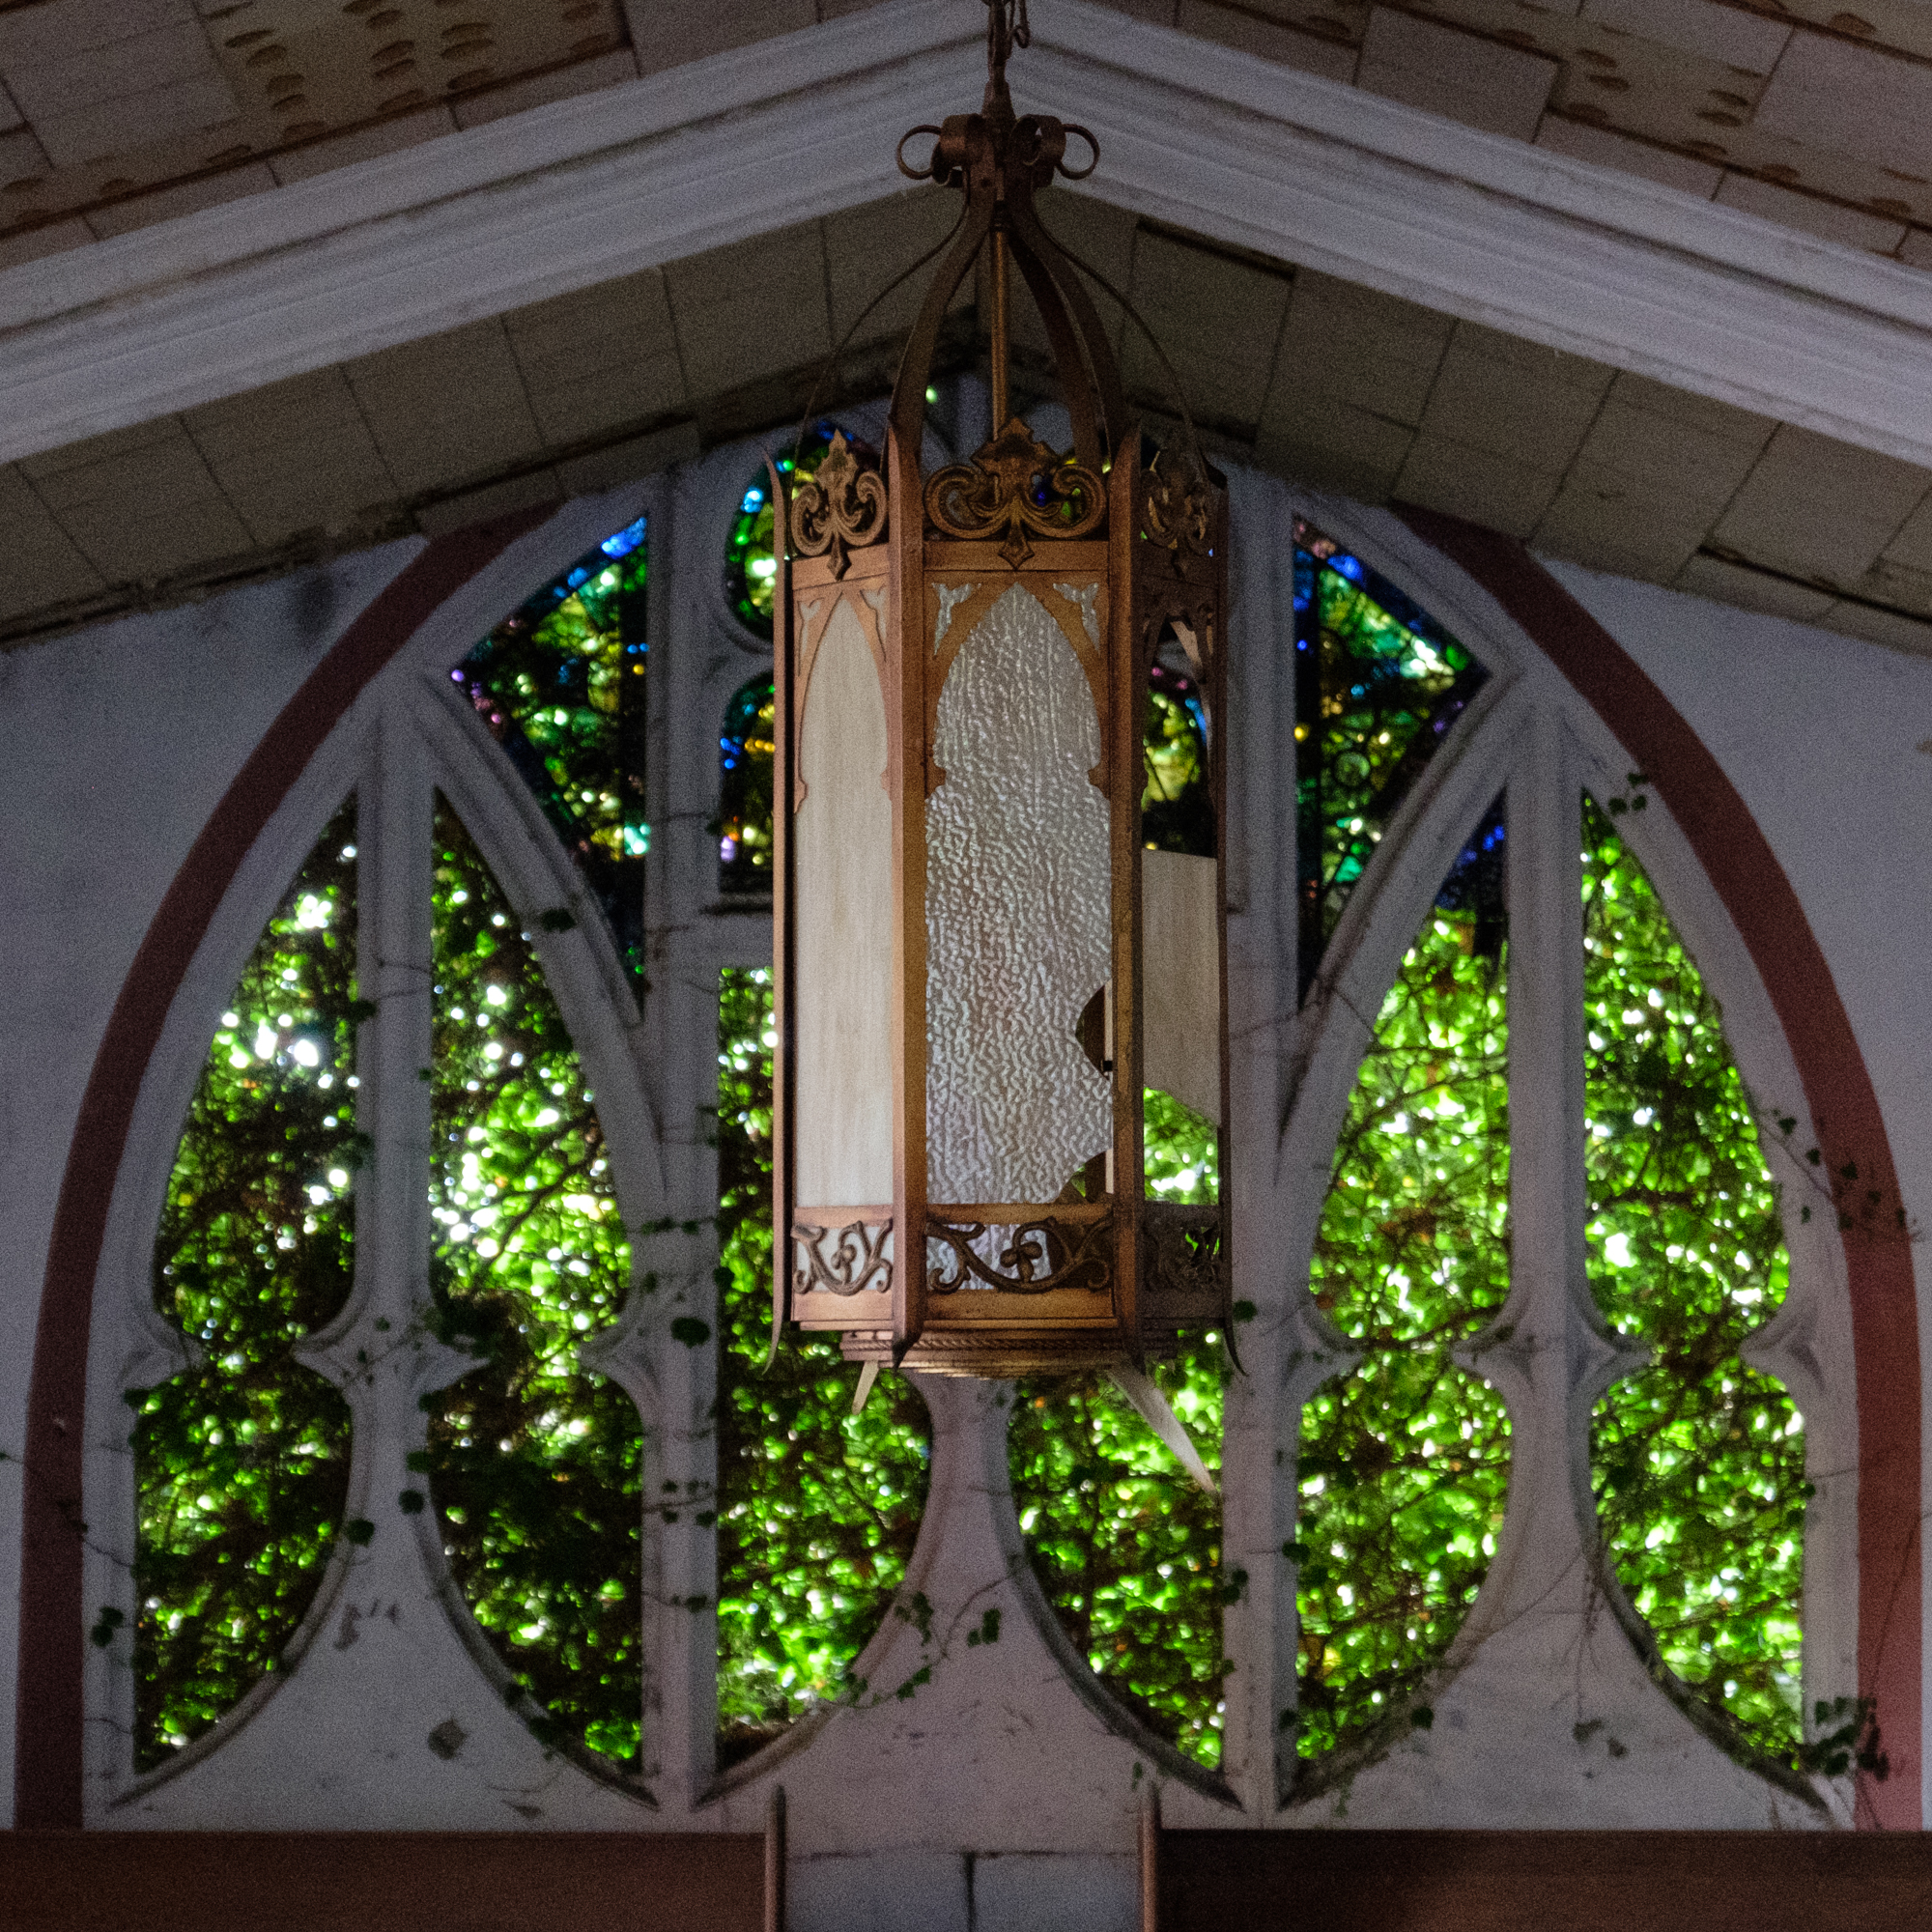 UX-CLE-Rehoboth Church_11.5.17-3_pp.jpg